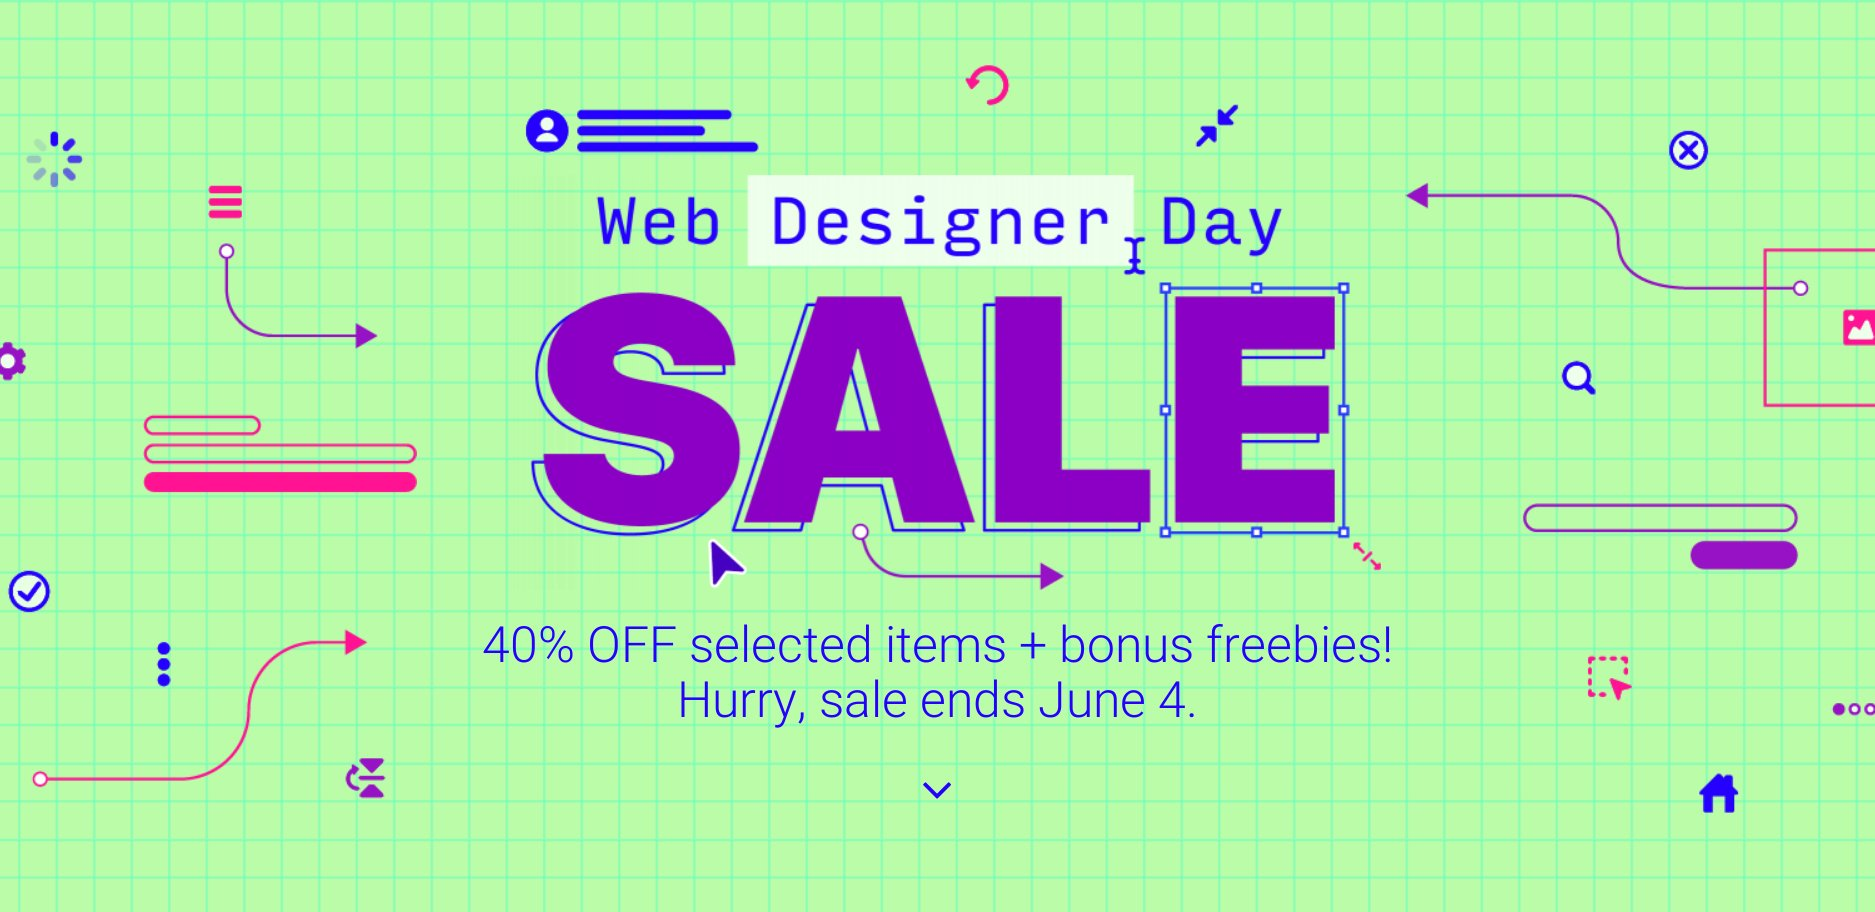 Envato Web Designer Day SALE 40% Plus 10 Freebies